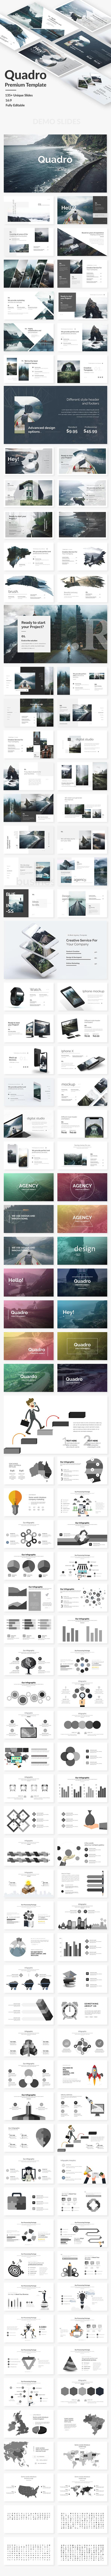 Quadro Premium Google Slide Template - Google Slides Presentation Templates